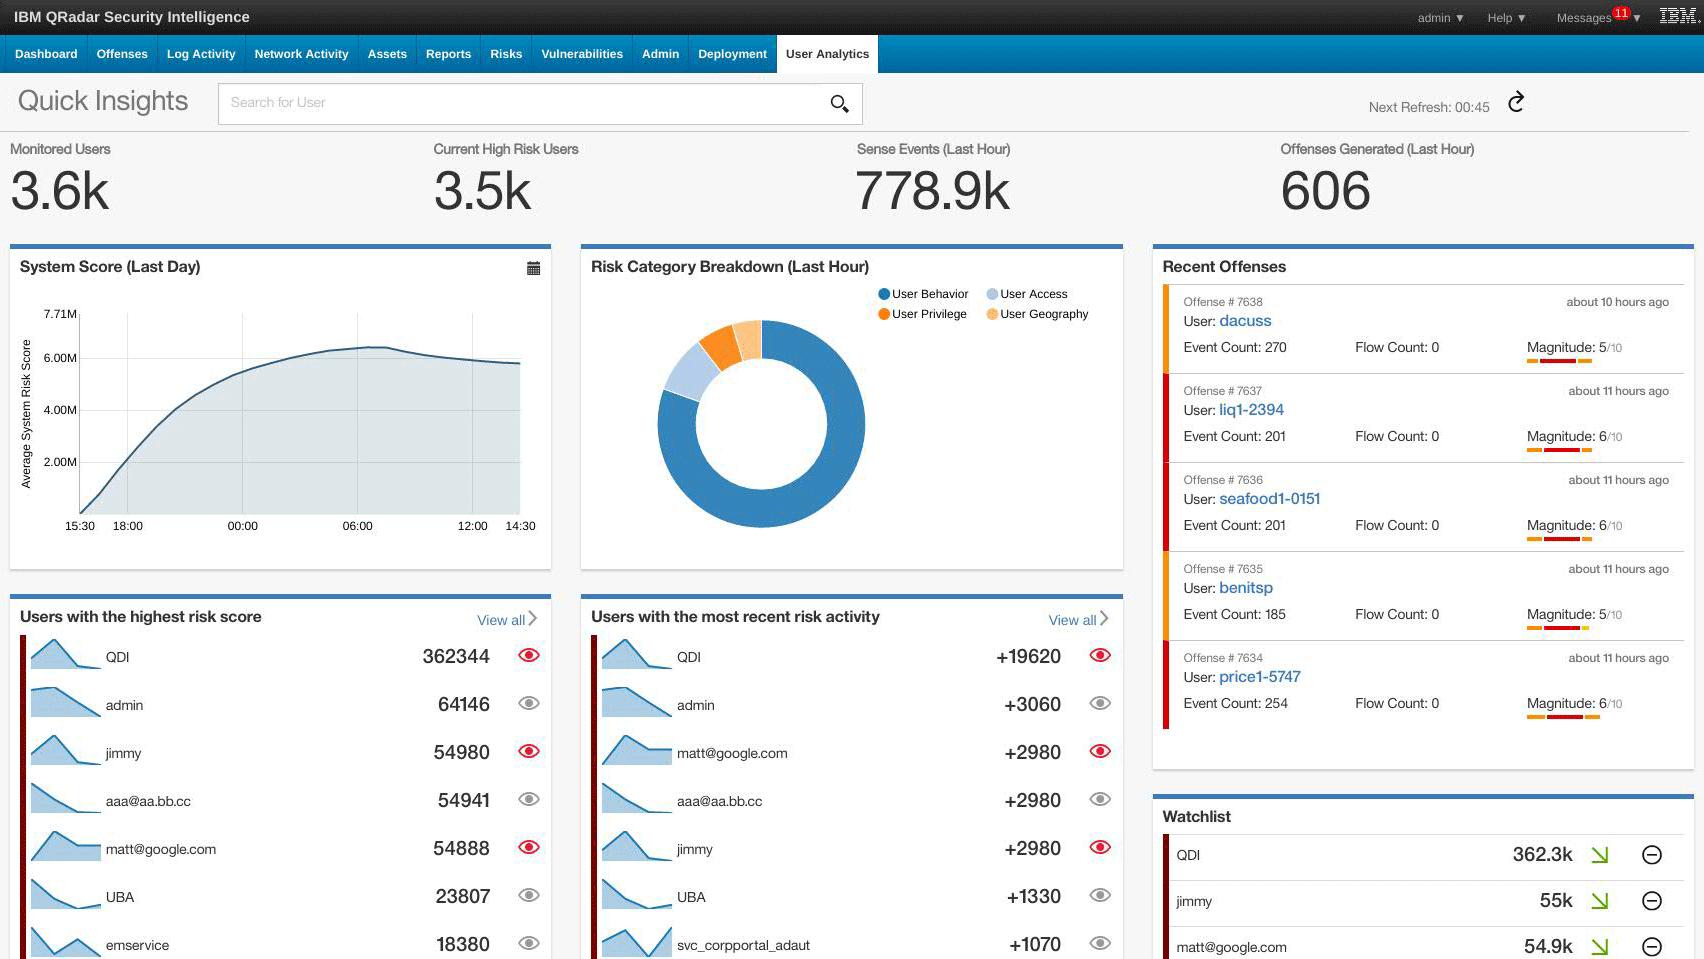 IBM QRadar on Cloud - Overview - Egypt